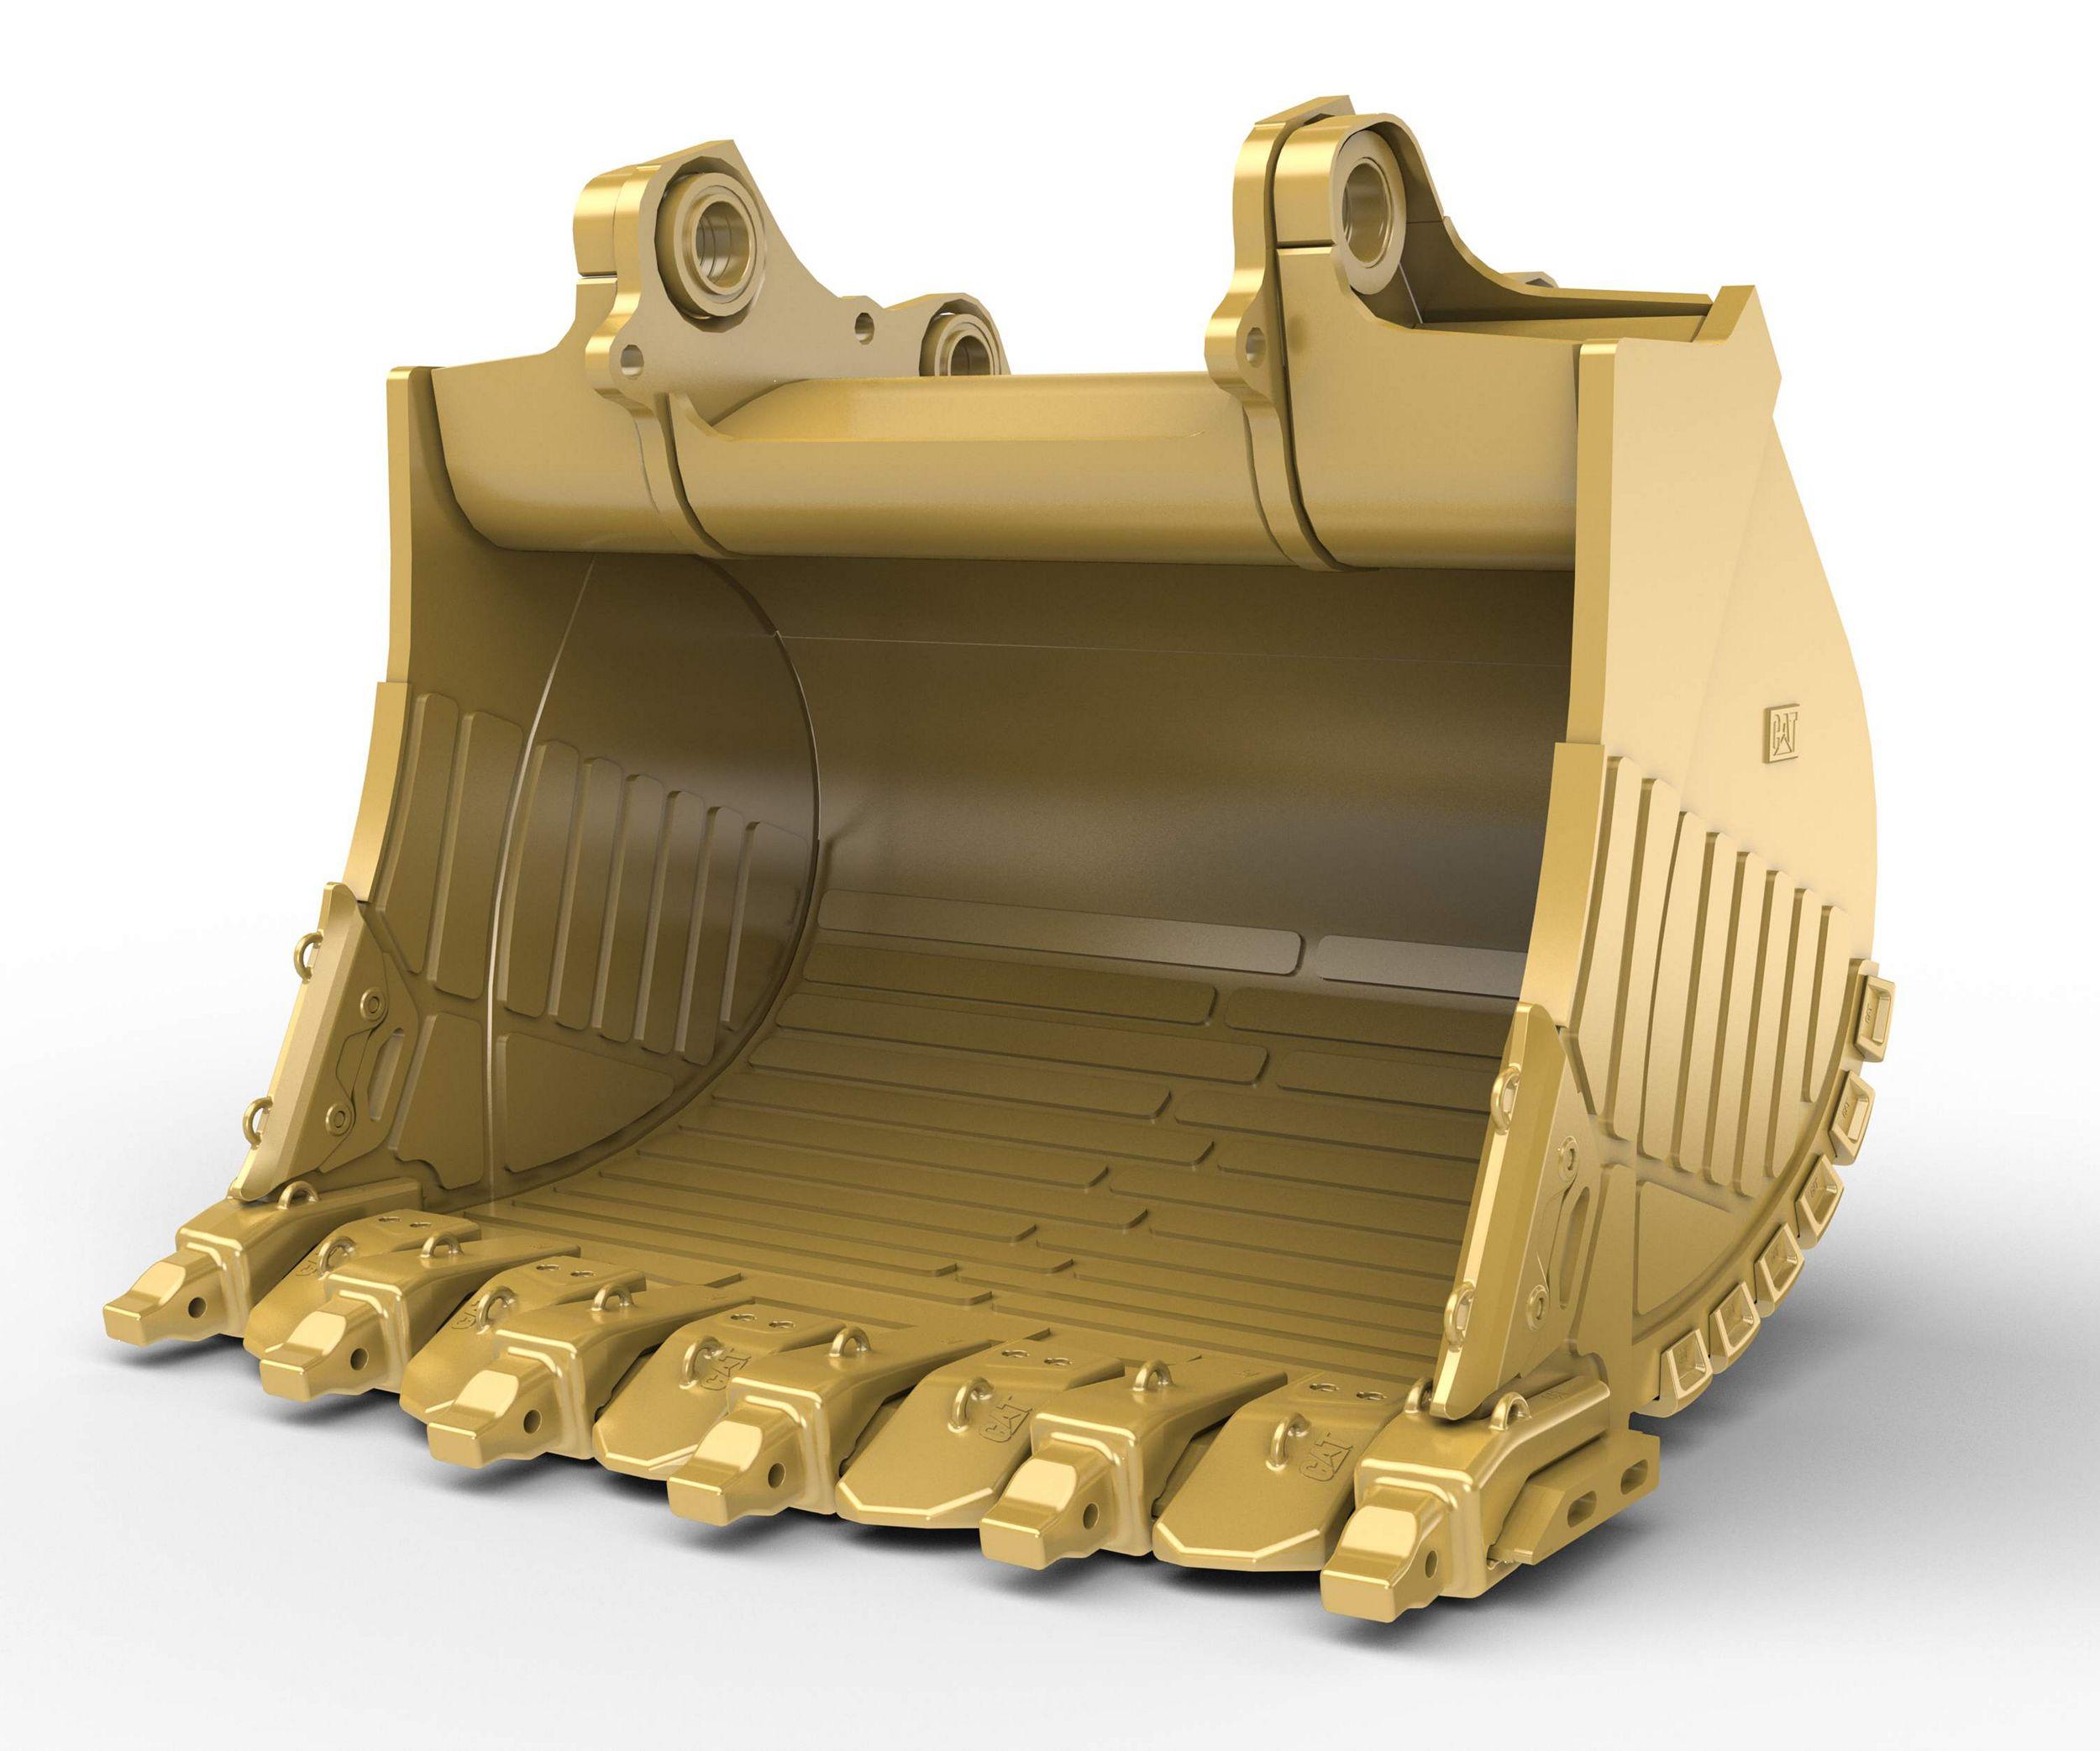 11m³ (14.4yd³) Heavy Rock bucket for the 6020B Hyd Mining Shovel